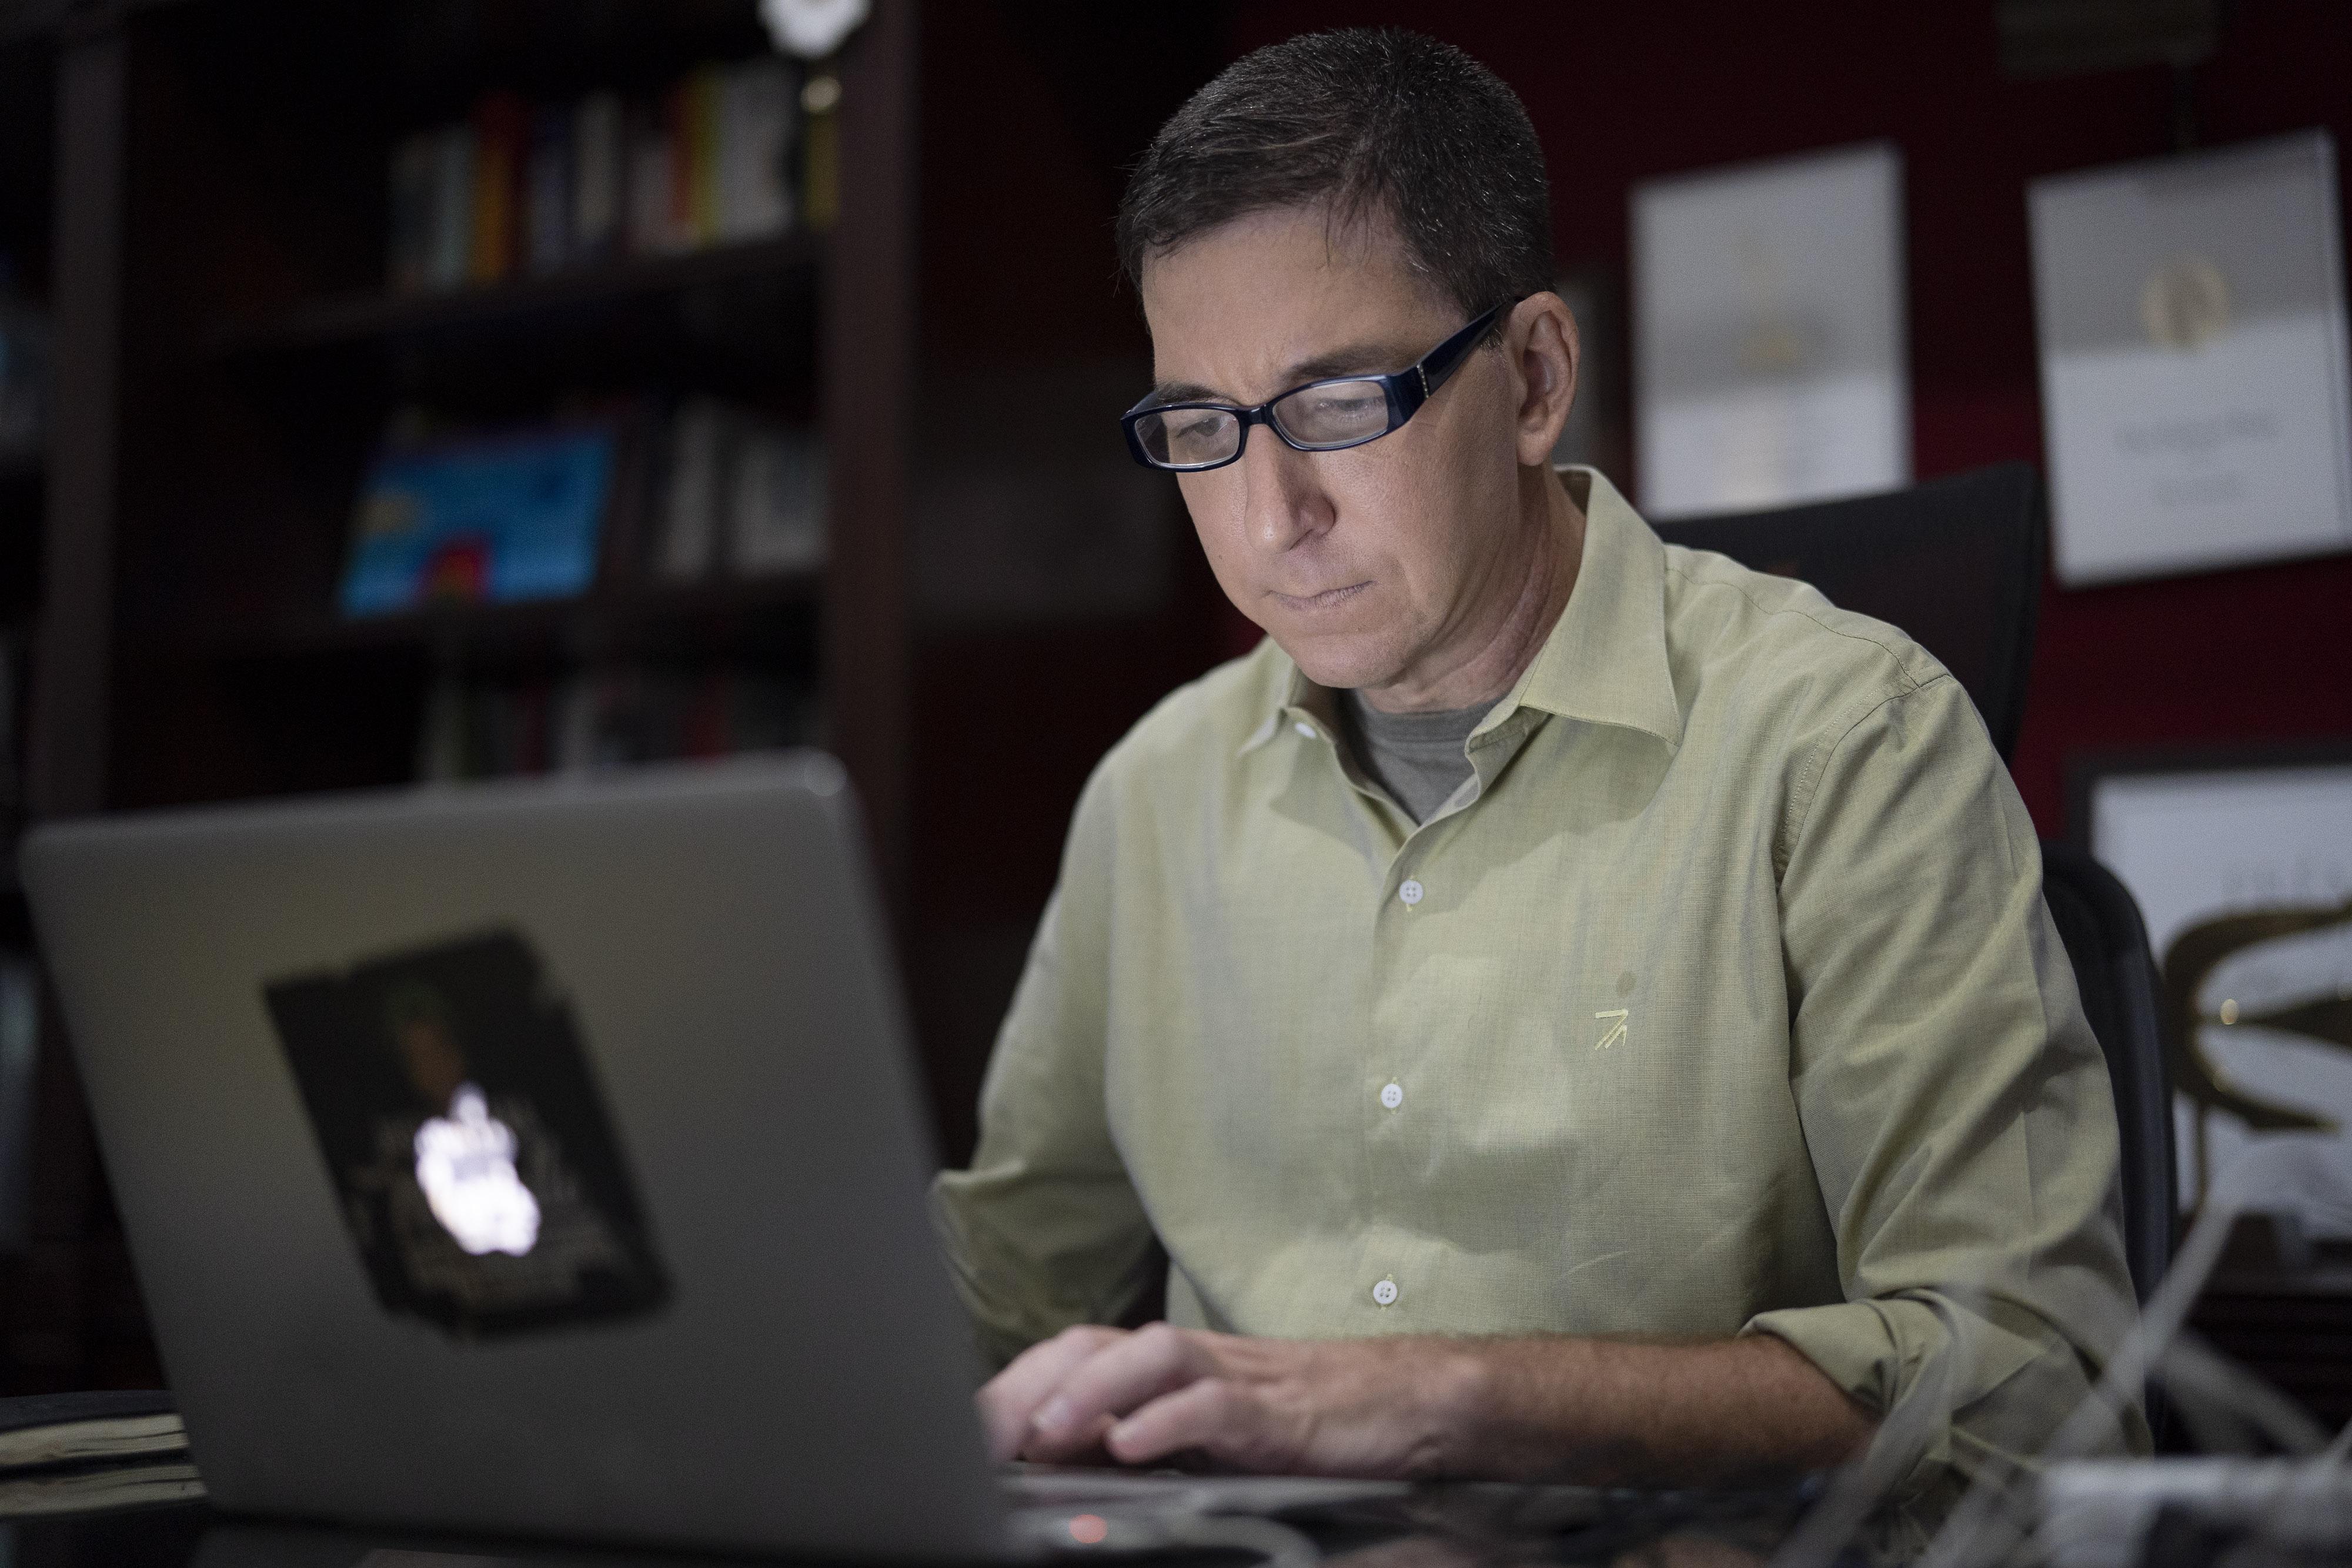 Brazil's president threatens to jail U.S. journalist Glenn Greenwald